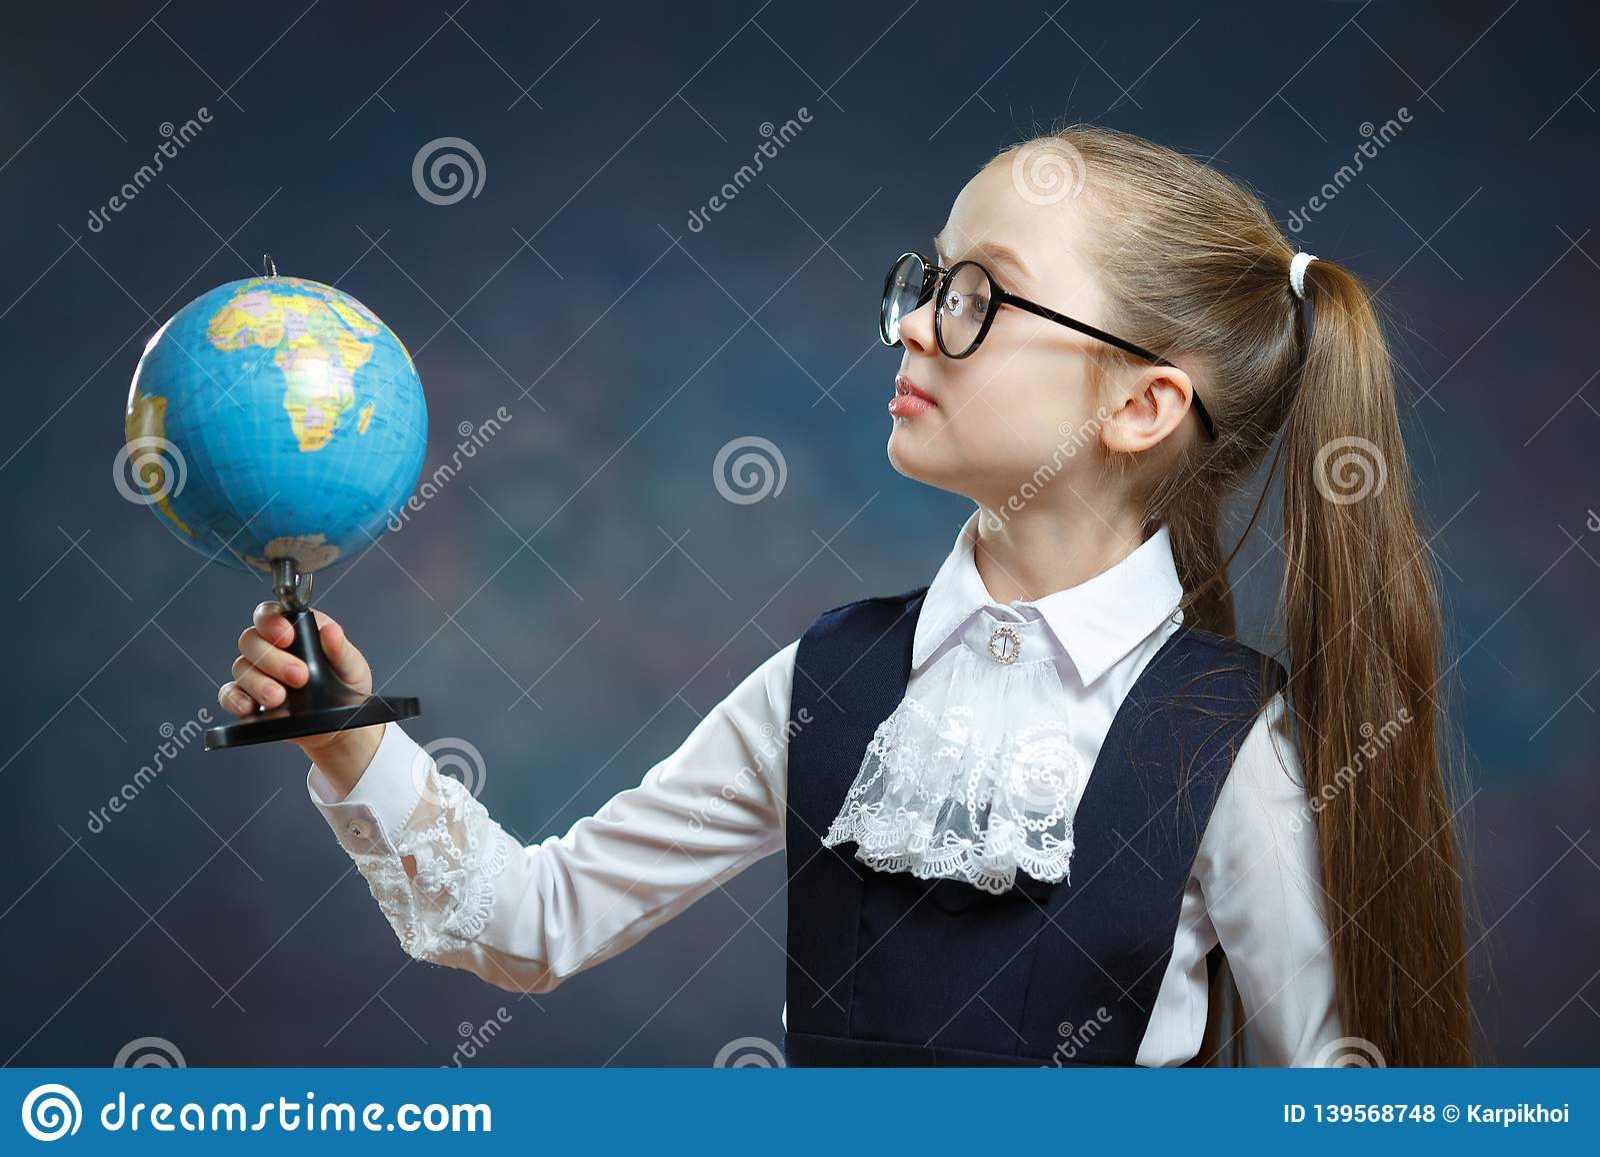 Blonde Little Schoolgirl Hold World Globe in Hand